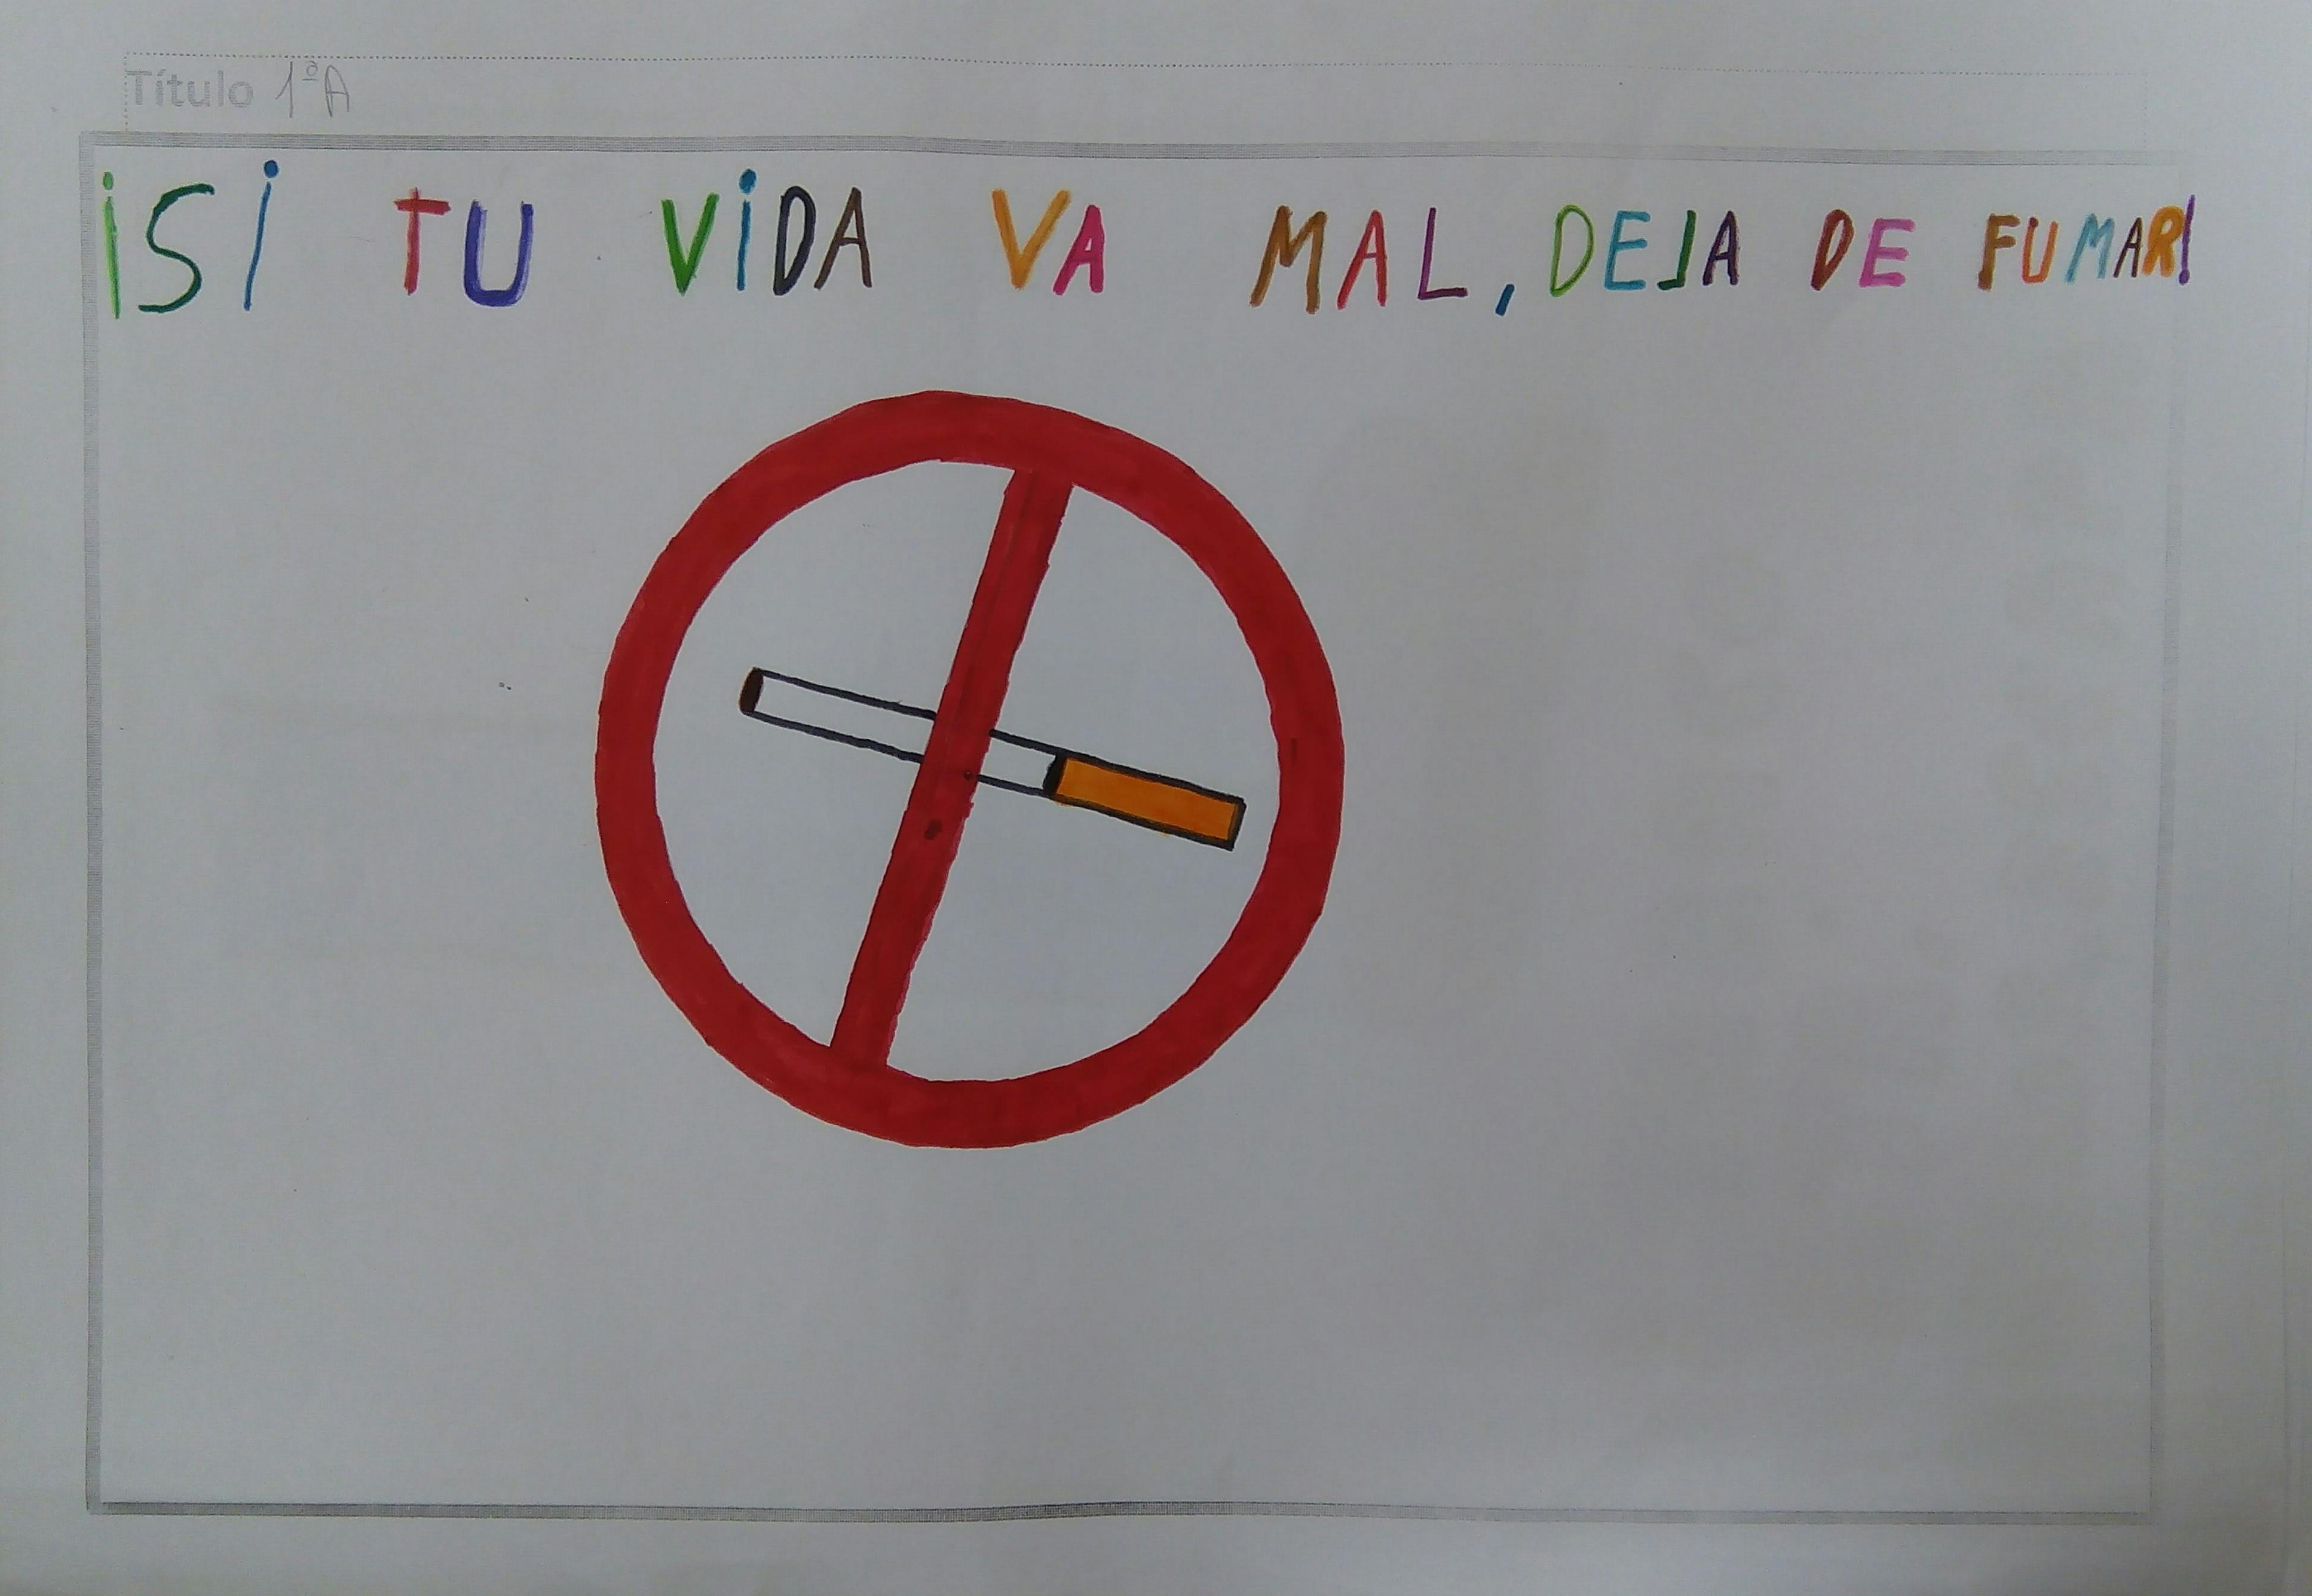 Clases den fume 1ºA (12)